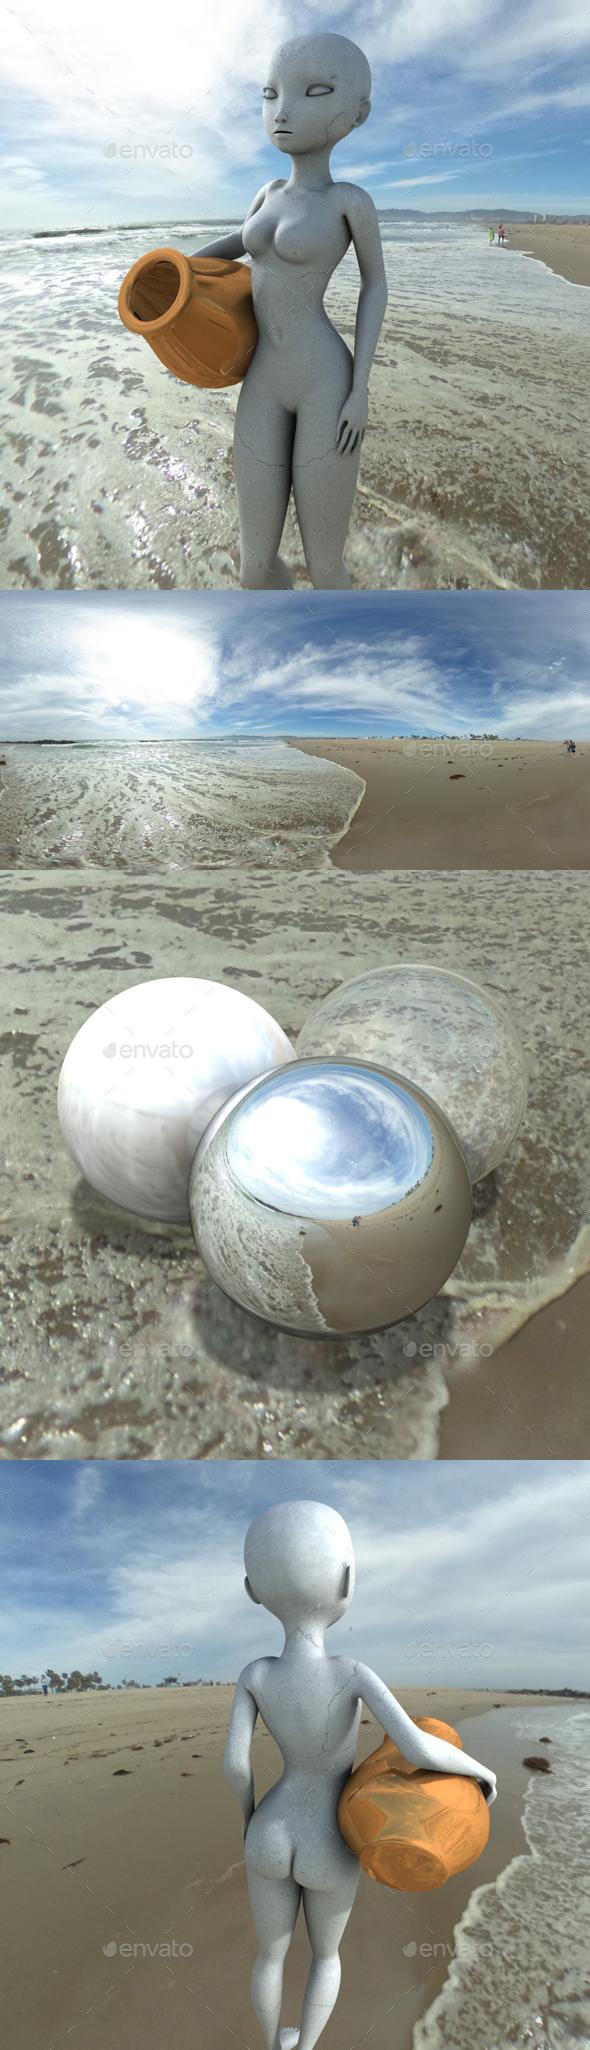 Shoreline Sunny Day HDRI - 3DOcean Item for Sale